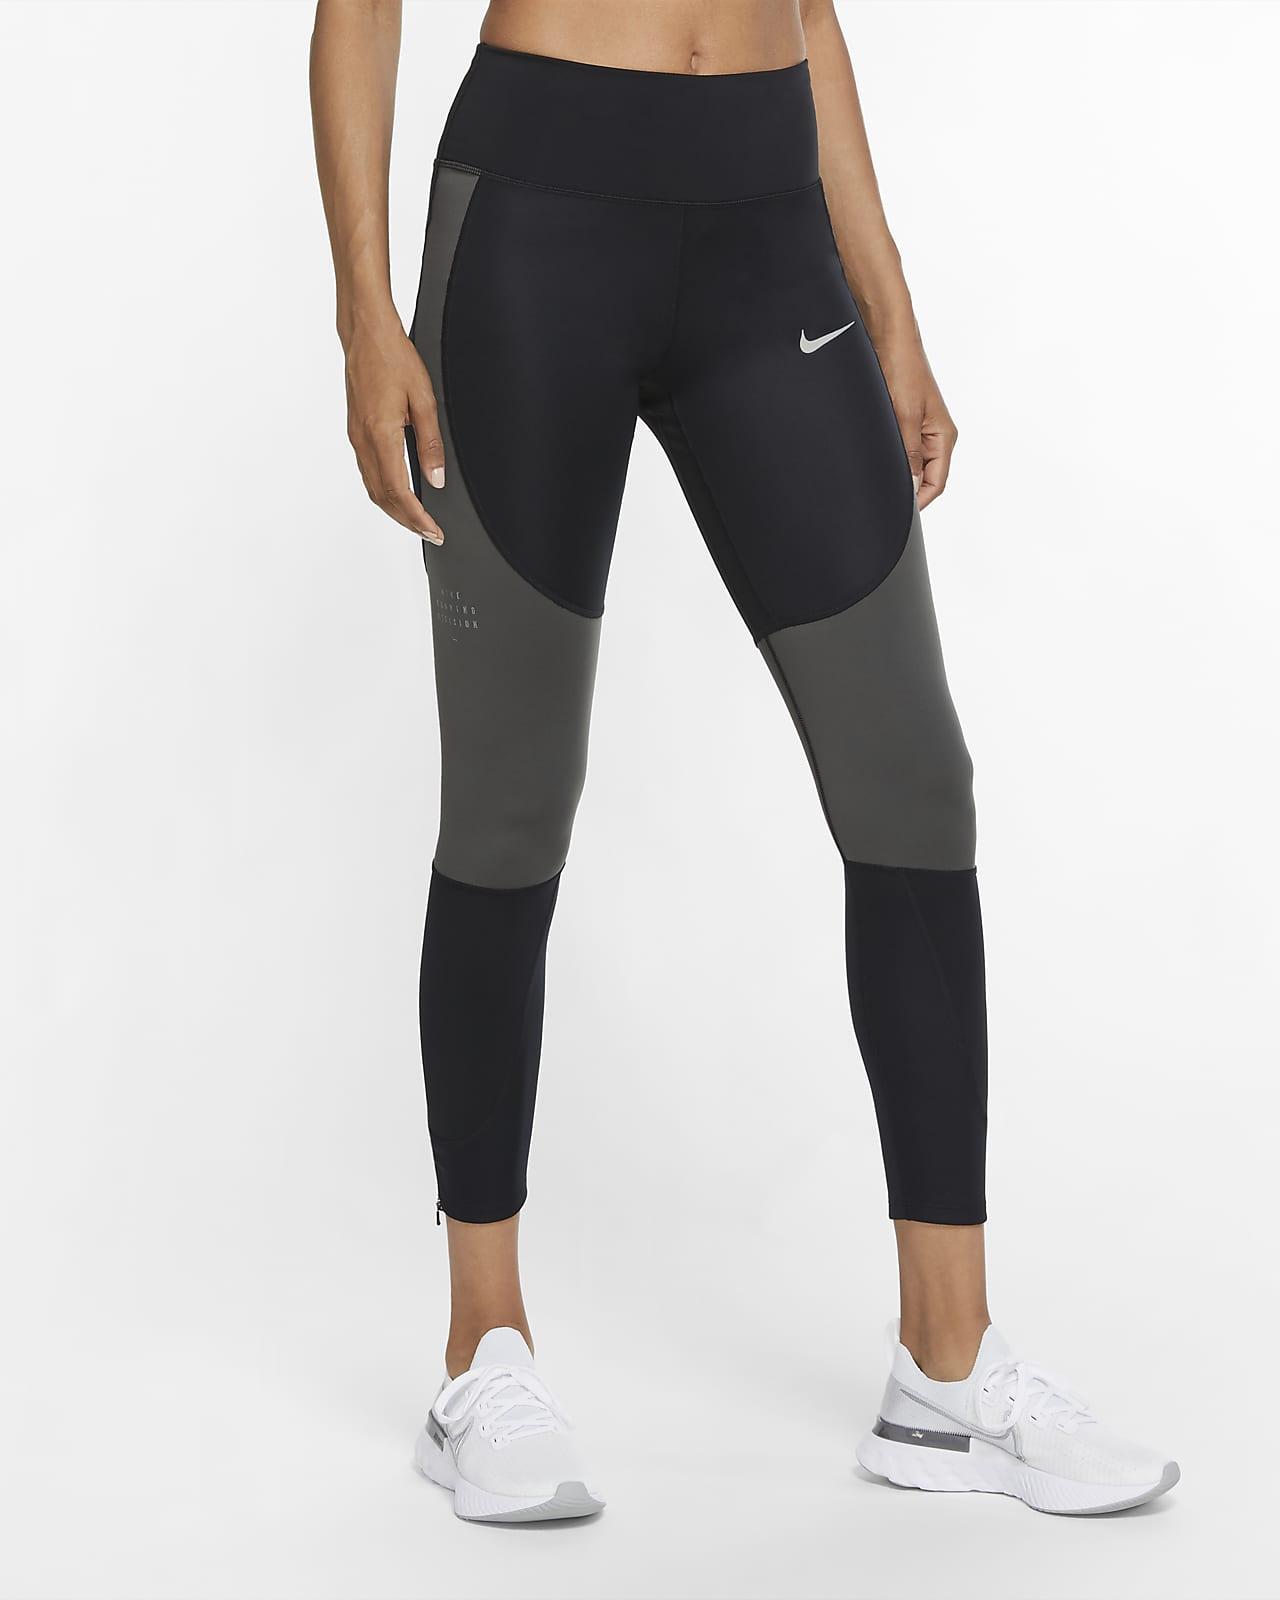 Damskie legginsy do biegania Nike Epic Luxe Run Division